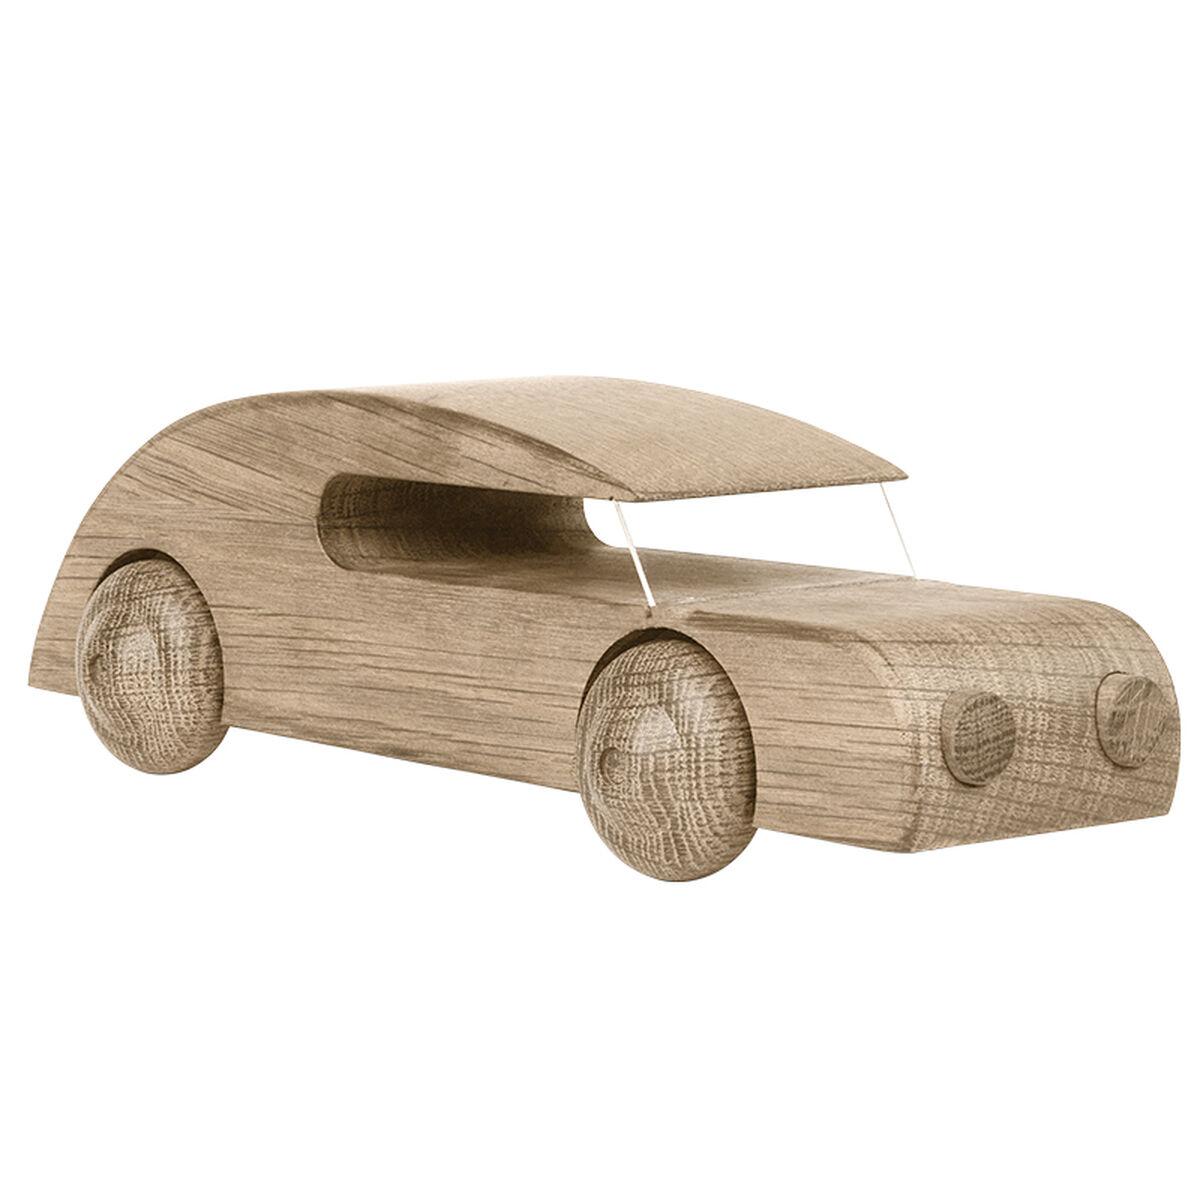 Kay Bojesen Sedan Automobil wooden car, large